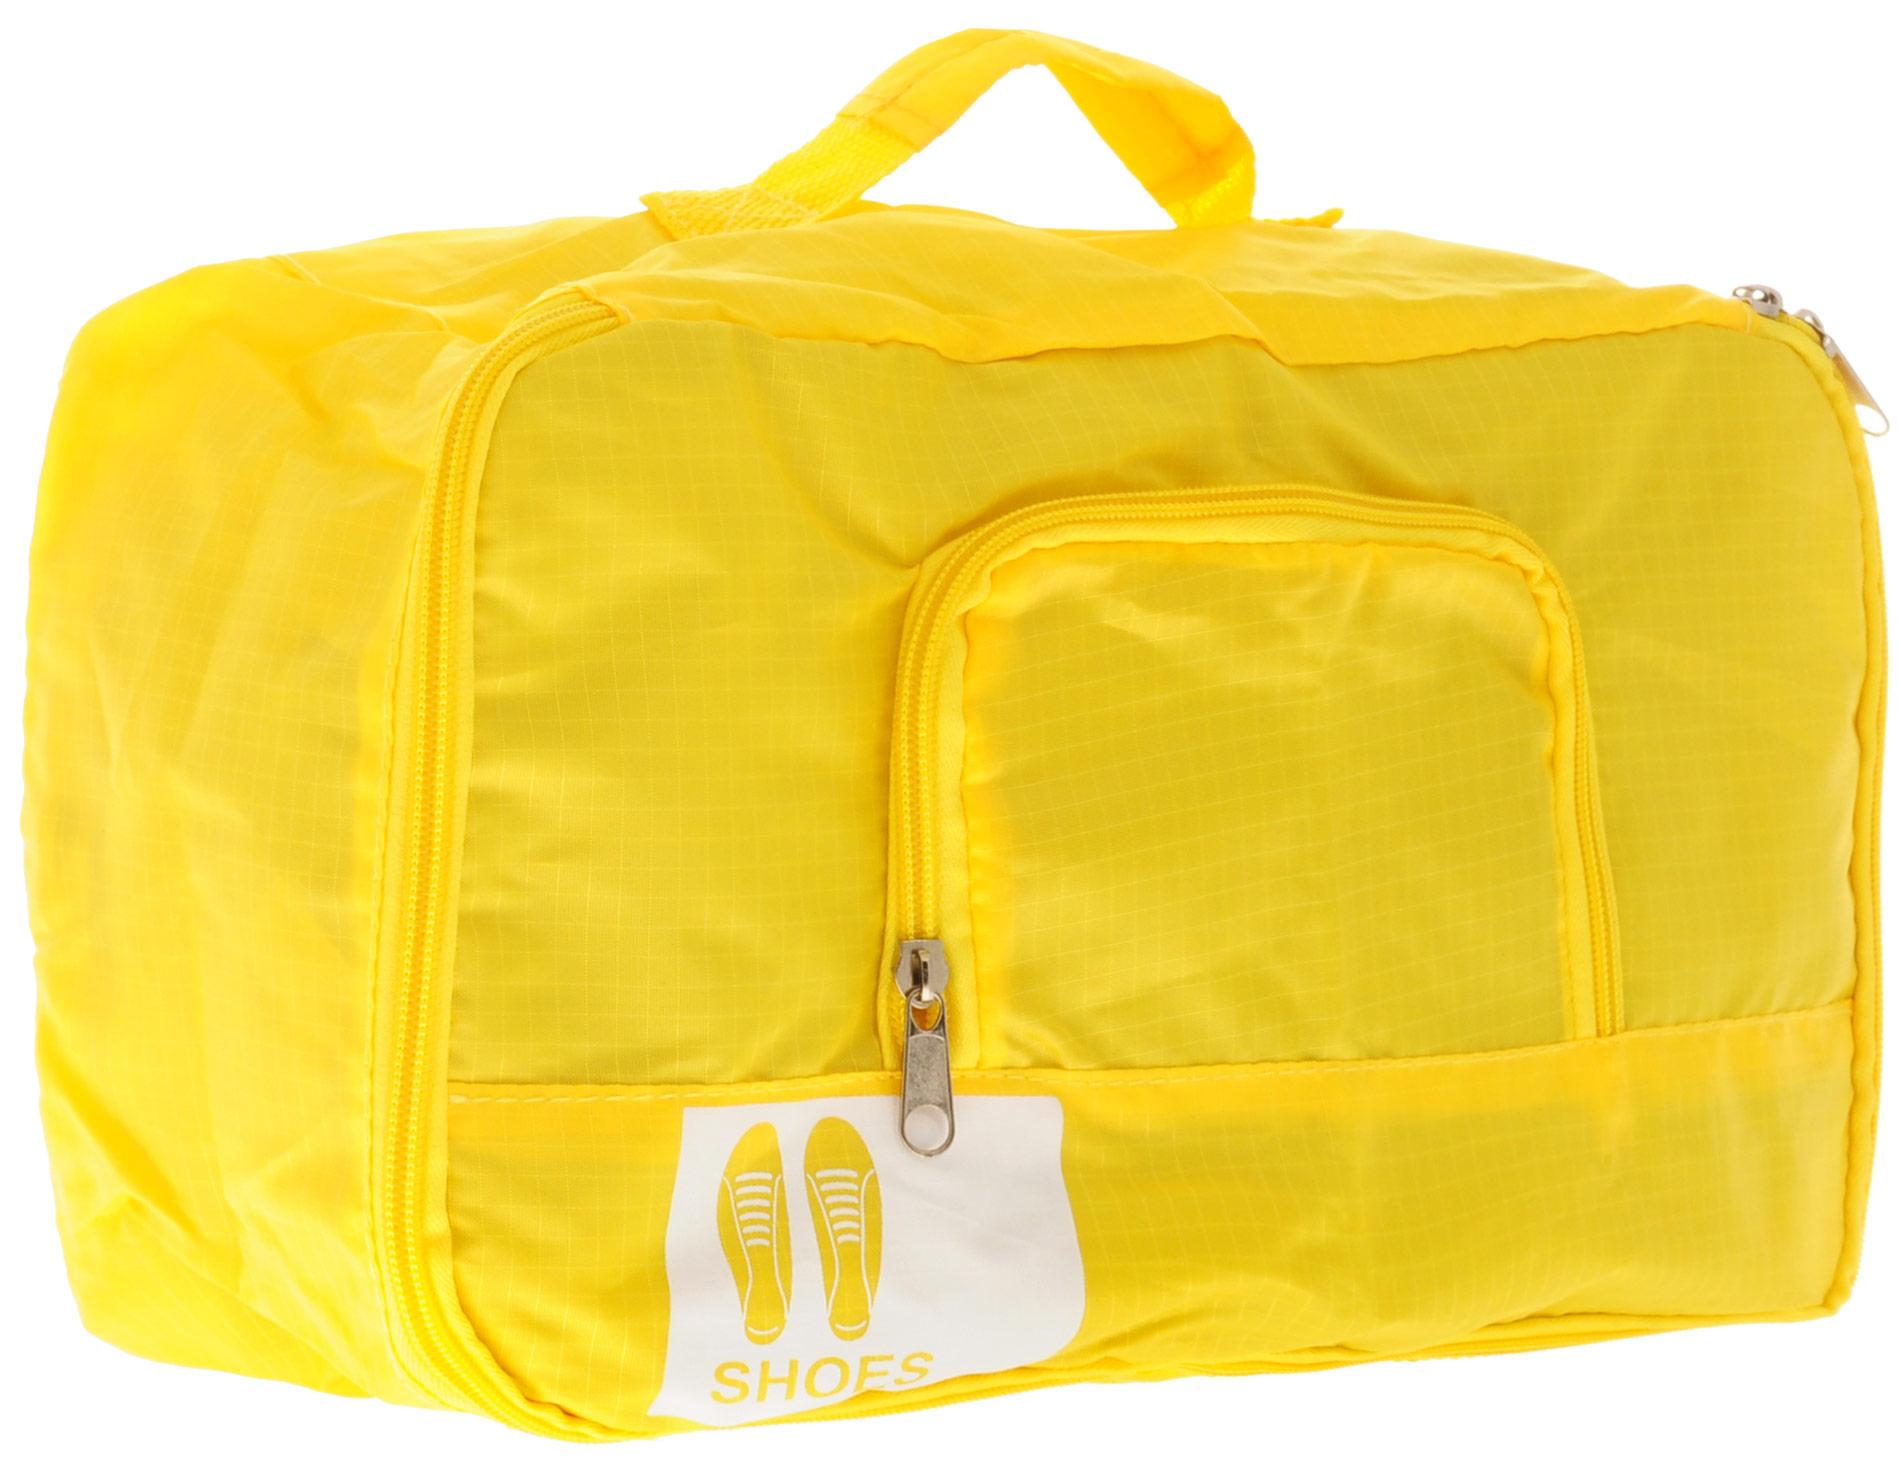 Colibri Чехол для обуви, цвет: желтый, 34 х 19 х 13 см чехол для обуви на молнии